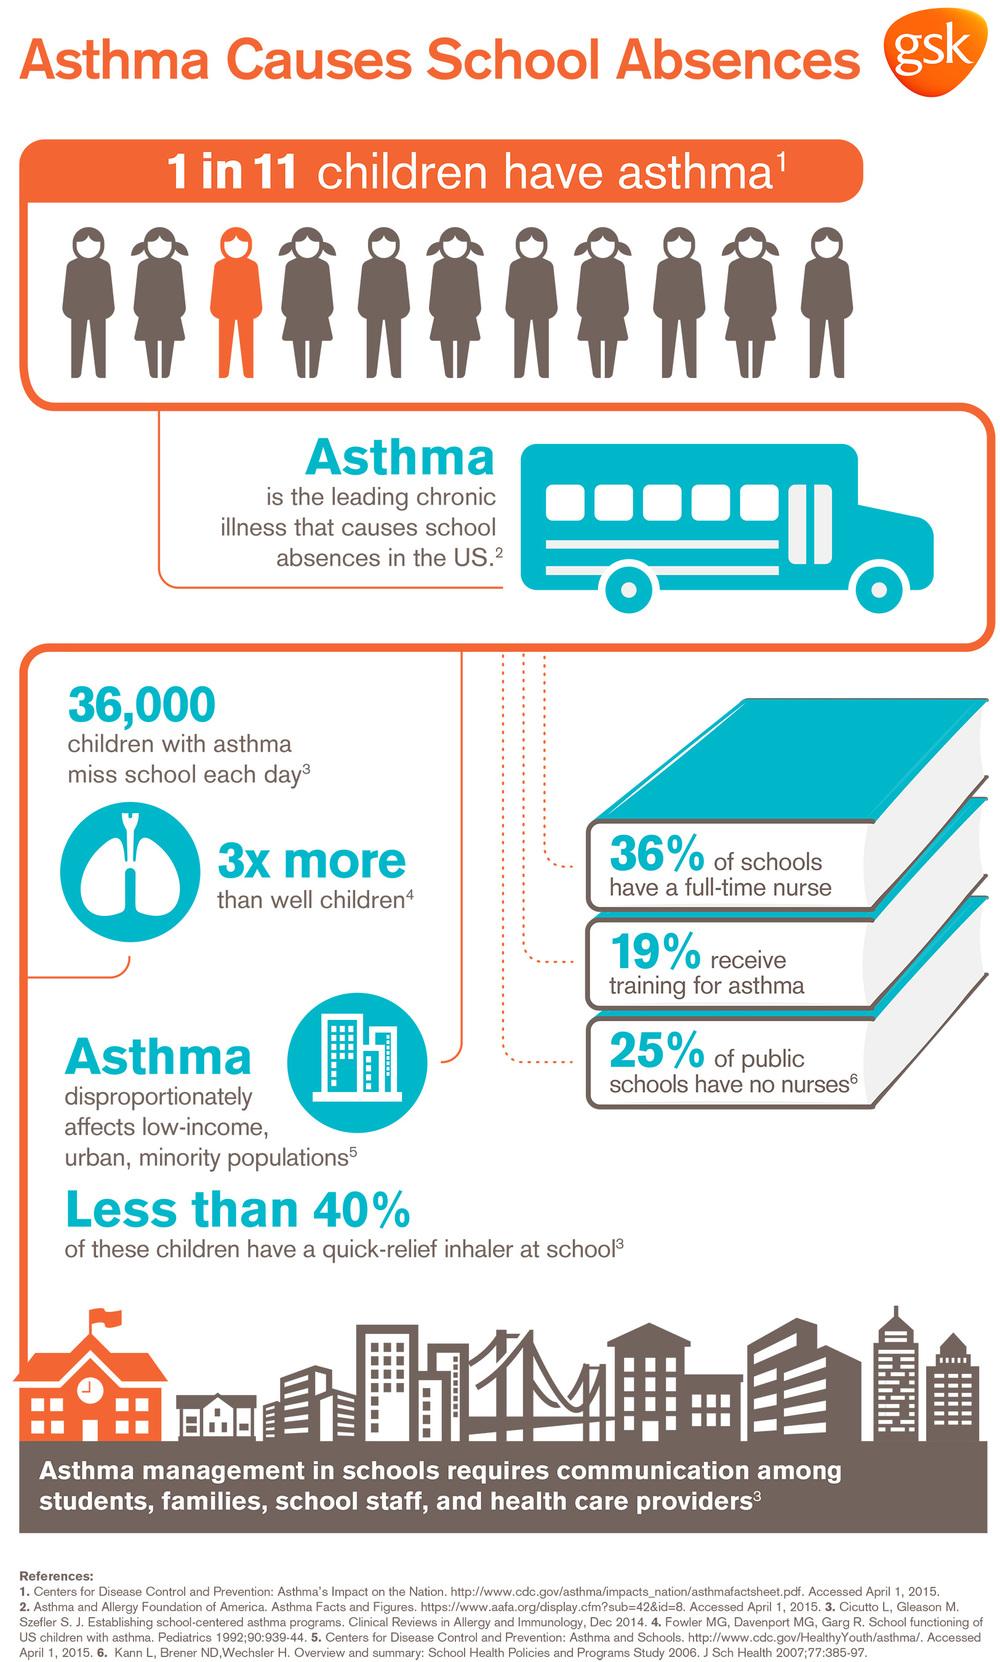 Asthma1 outlook-12